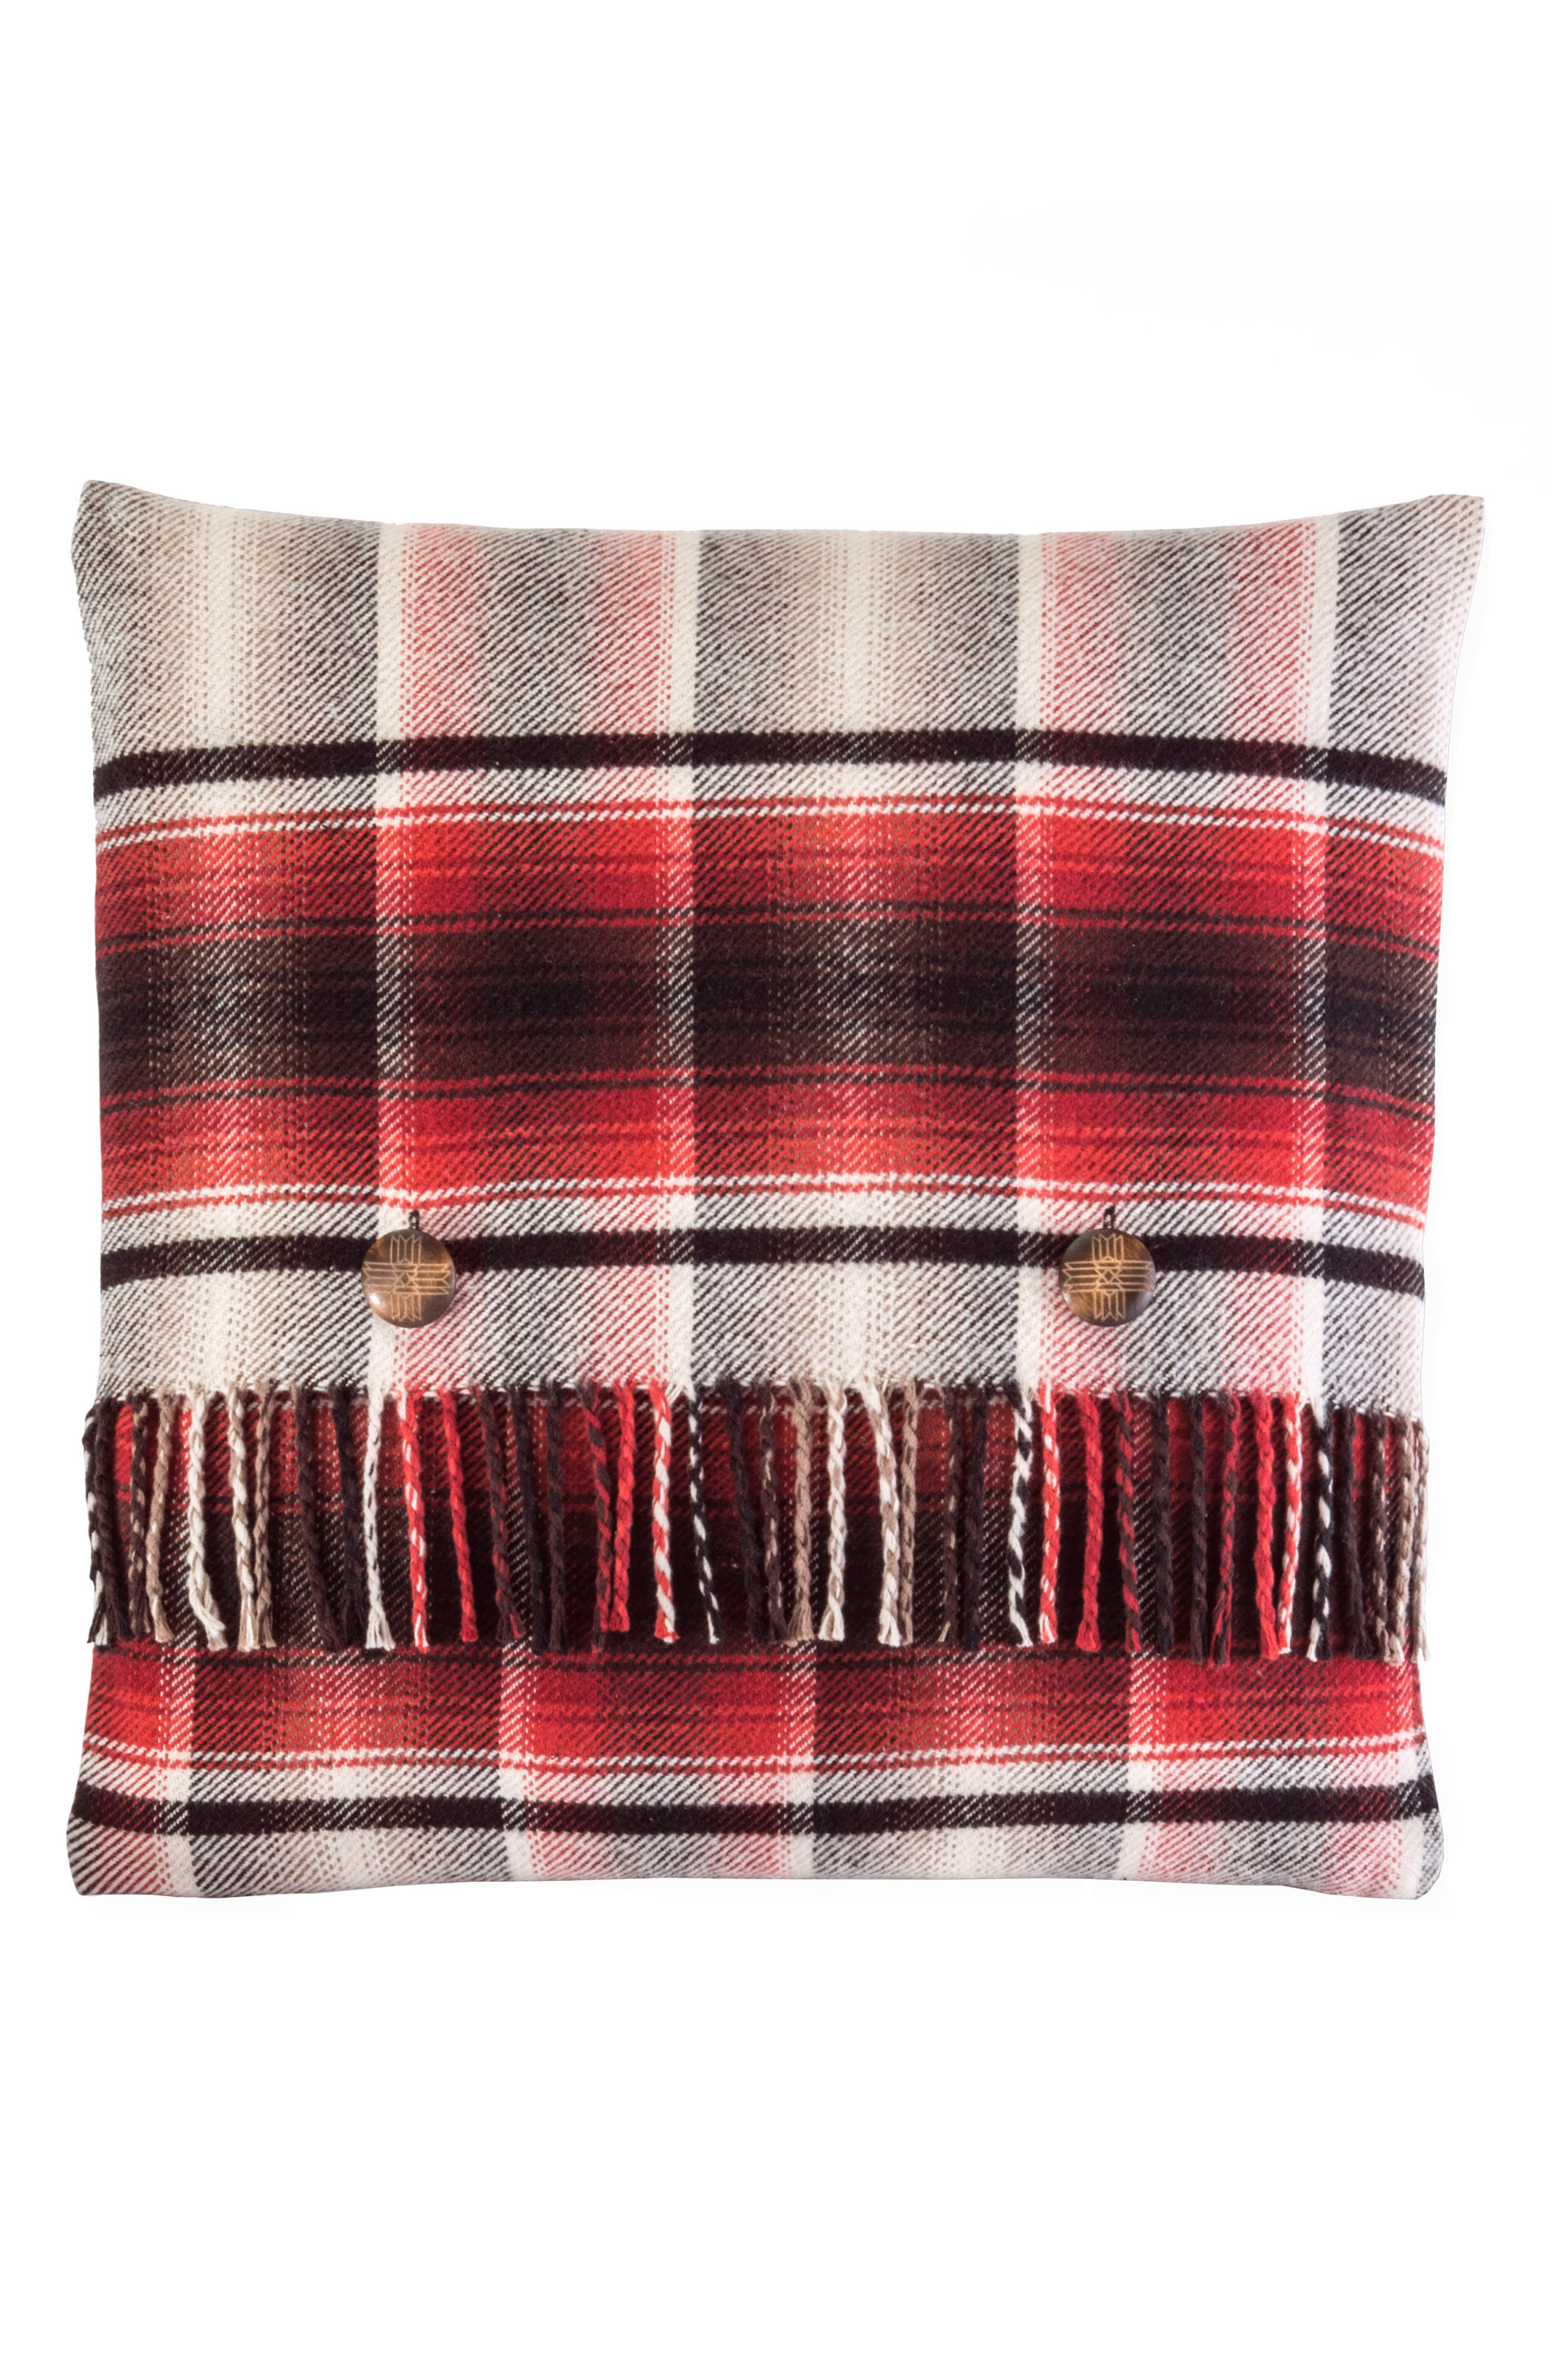 Board Shirt Plaid Pillow,                             Main thumbnail 1, color,                             600